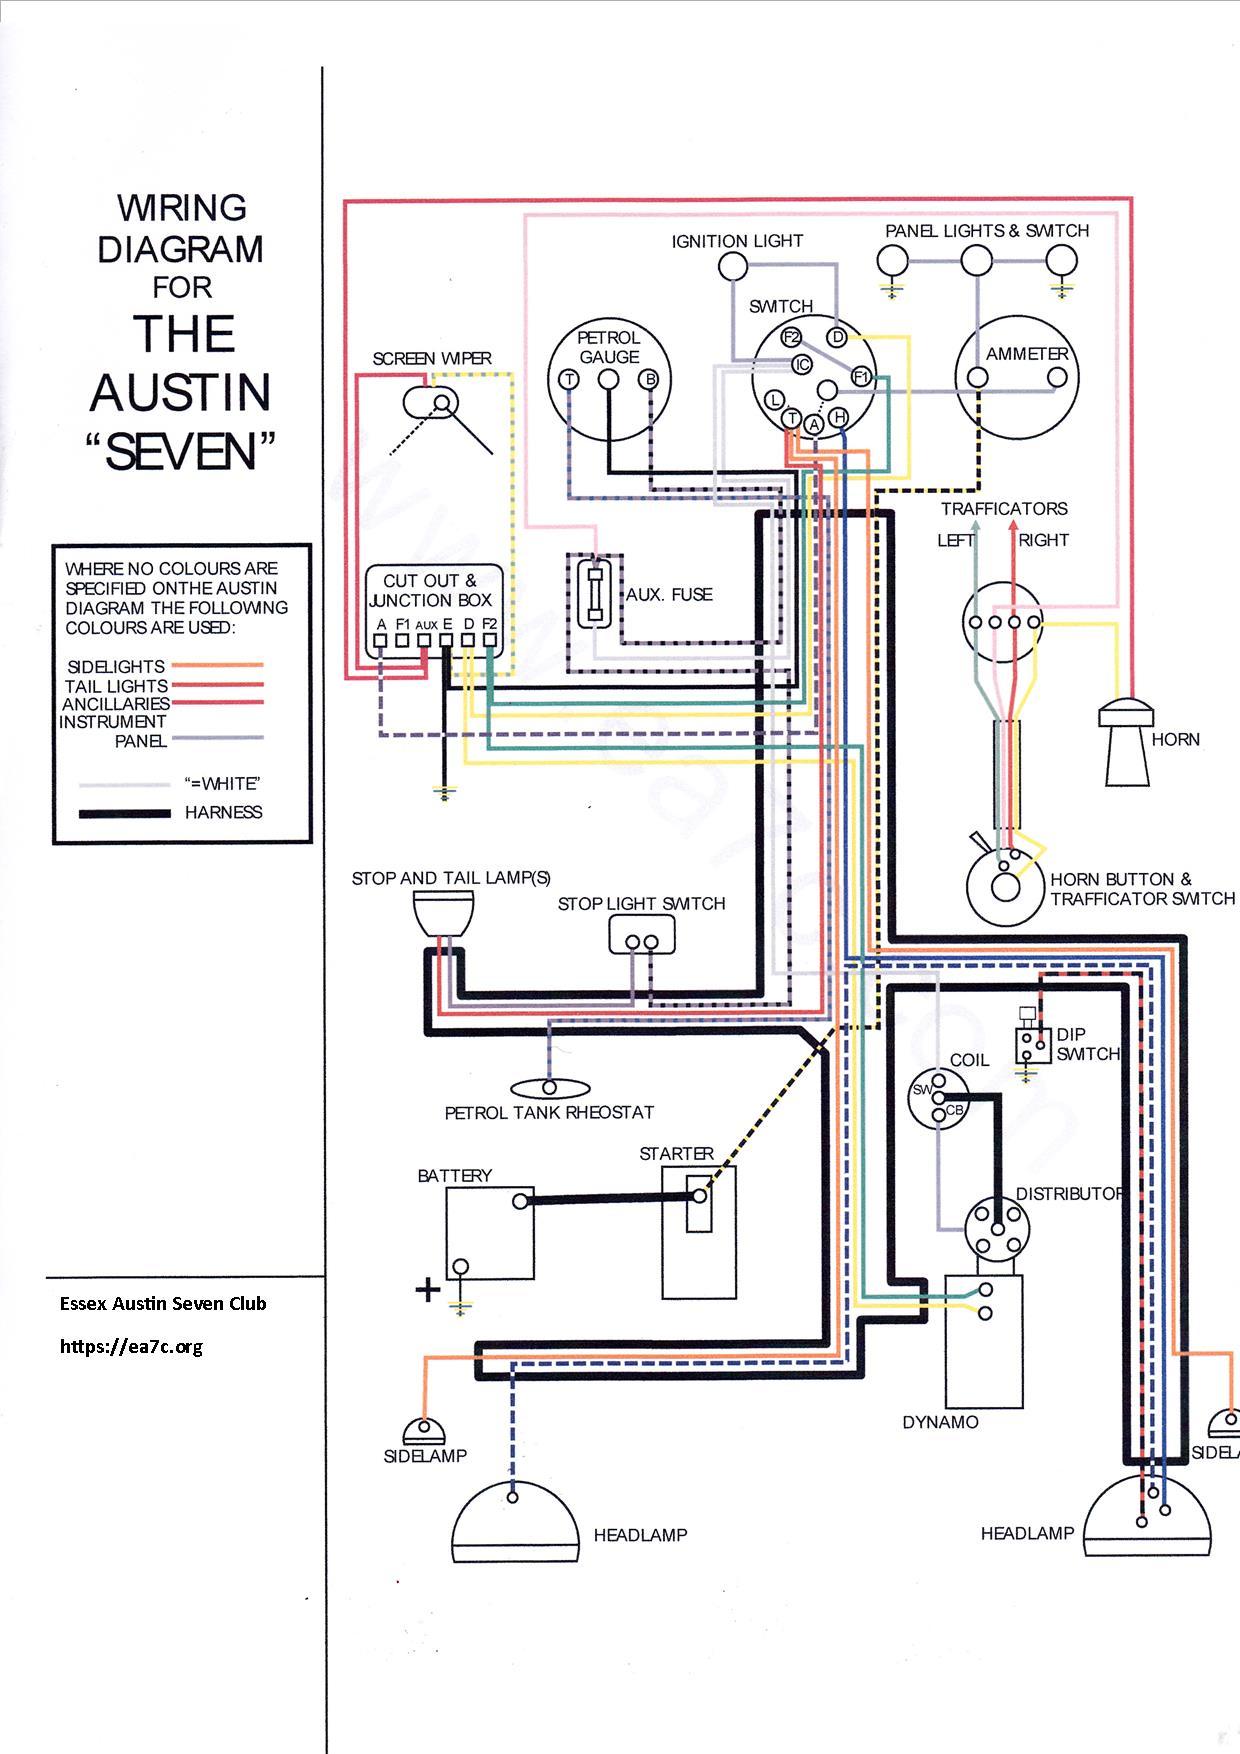 Austin Distributor Wiring Diagram Mastering 2002 Kia Sedona Instrument Cluster Fuse Box Amotmx Technical Data Essex Seven Club Rh Ea7c Org Points Coil And